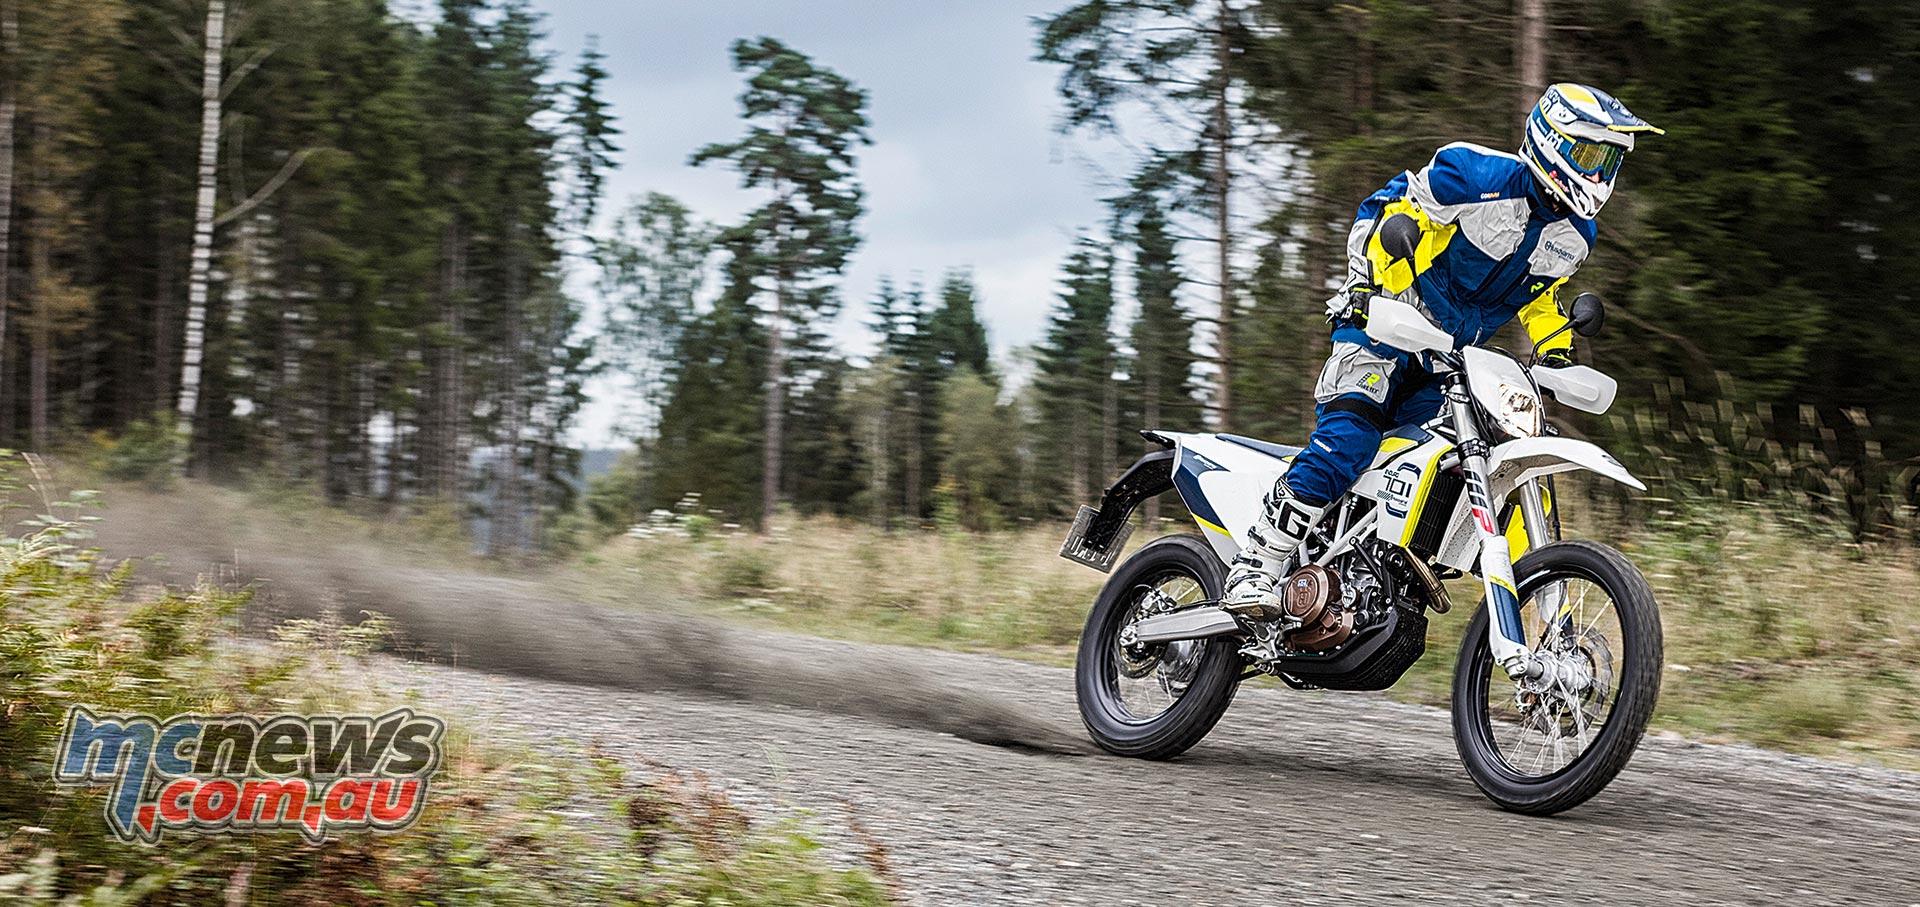 74hp For 2017 Husqvarna 701 Enduro And Supermoto Mcnews